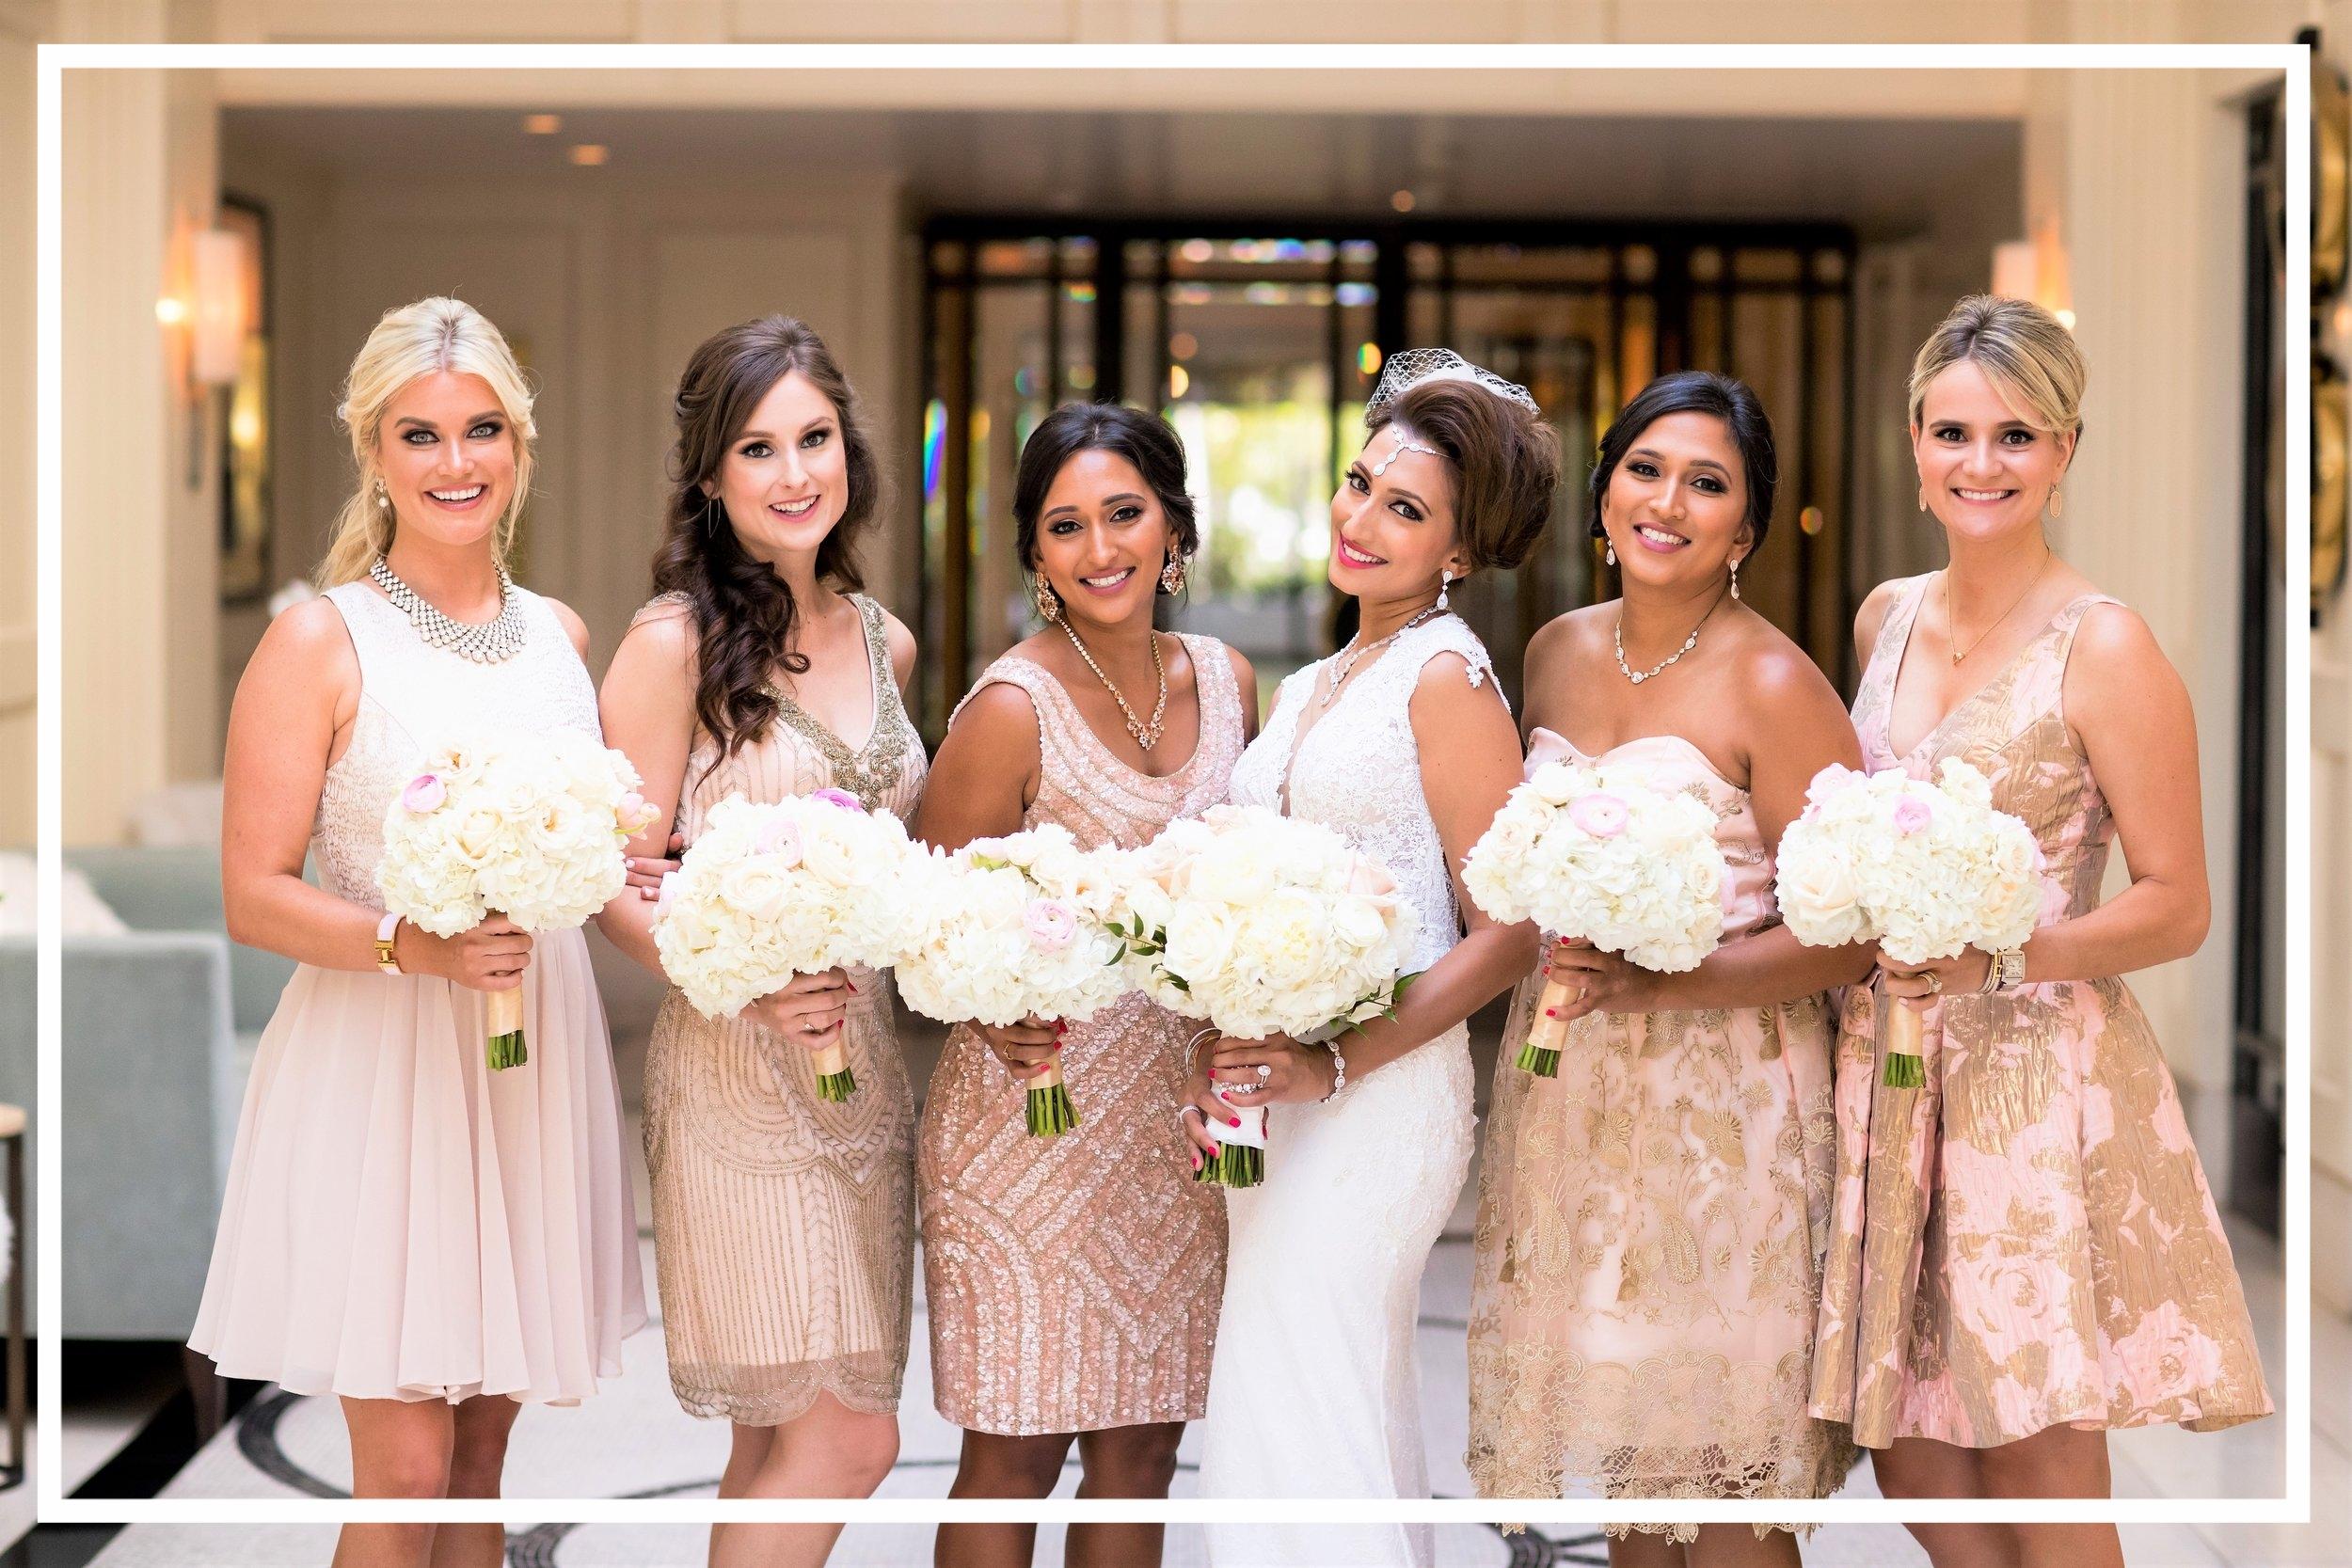 Rita-Carey-wedding-photos-portraits-49.JPG